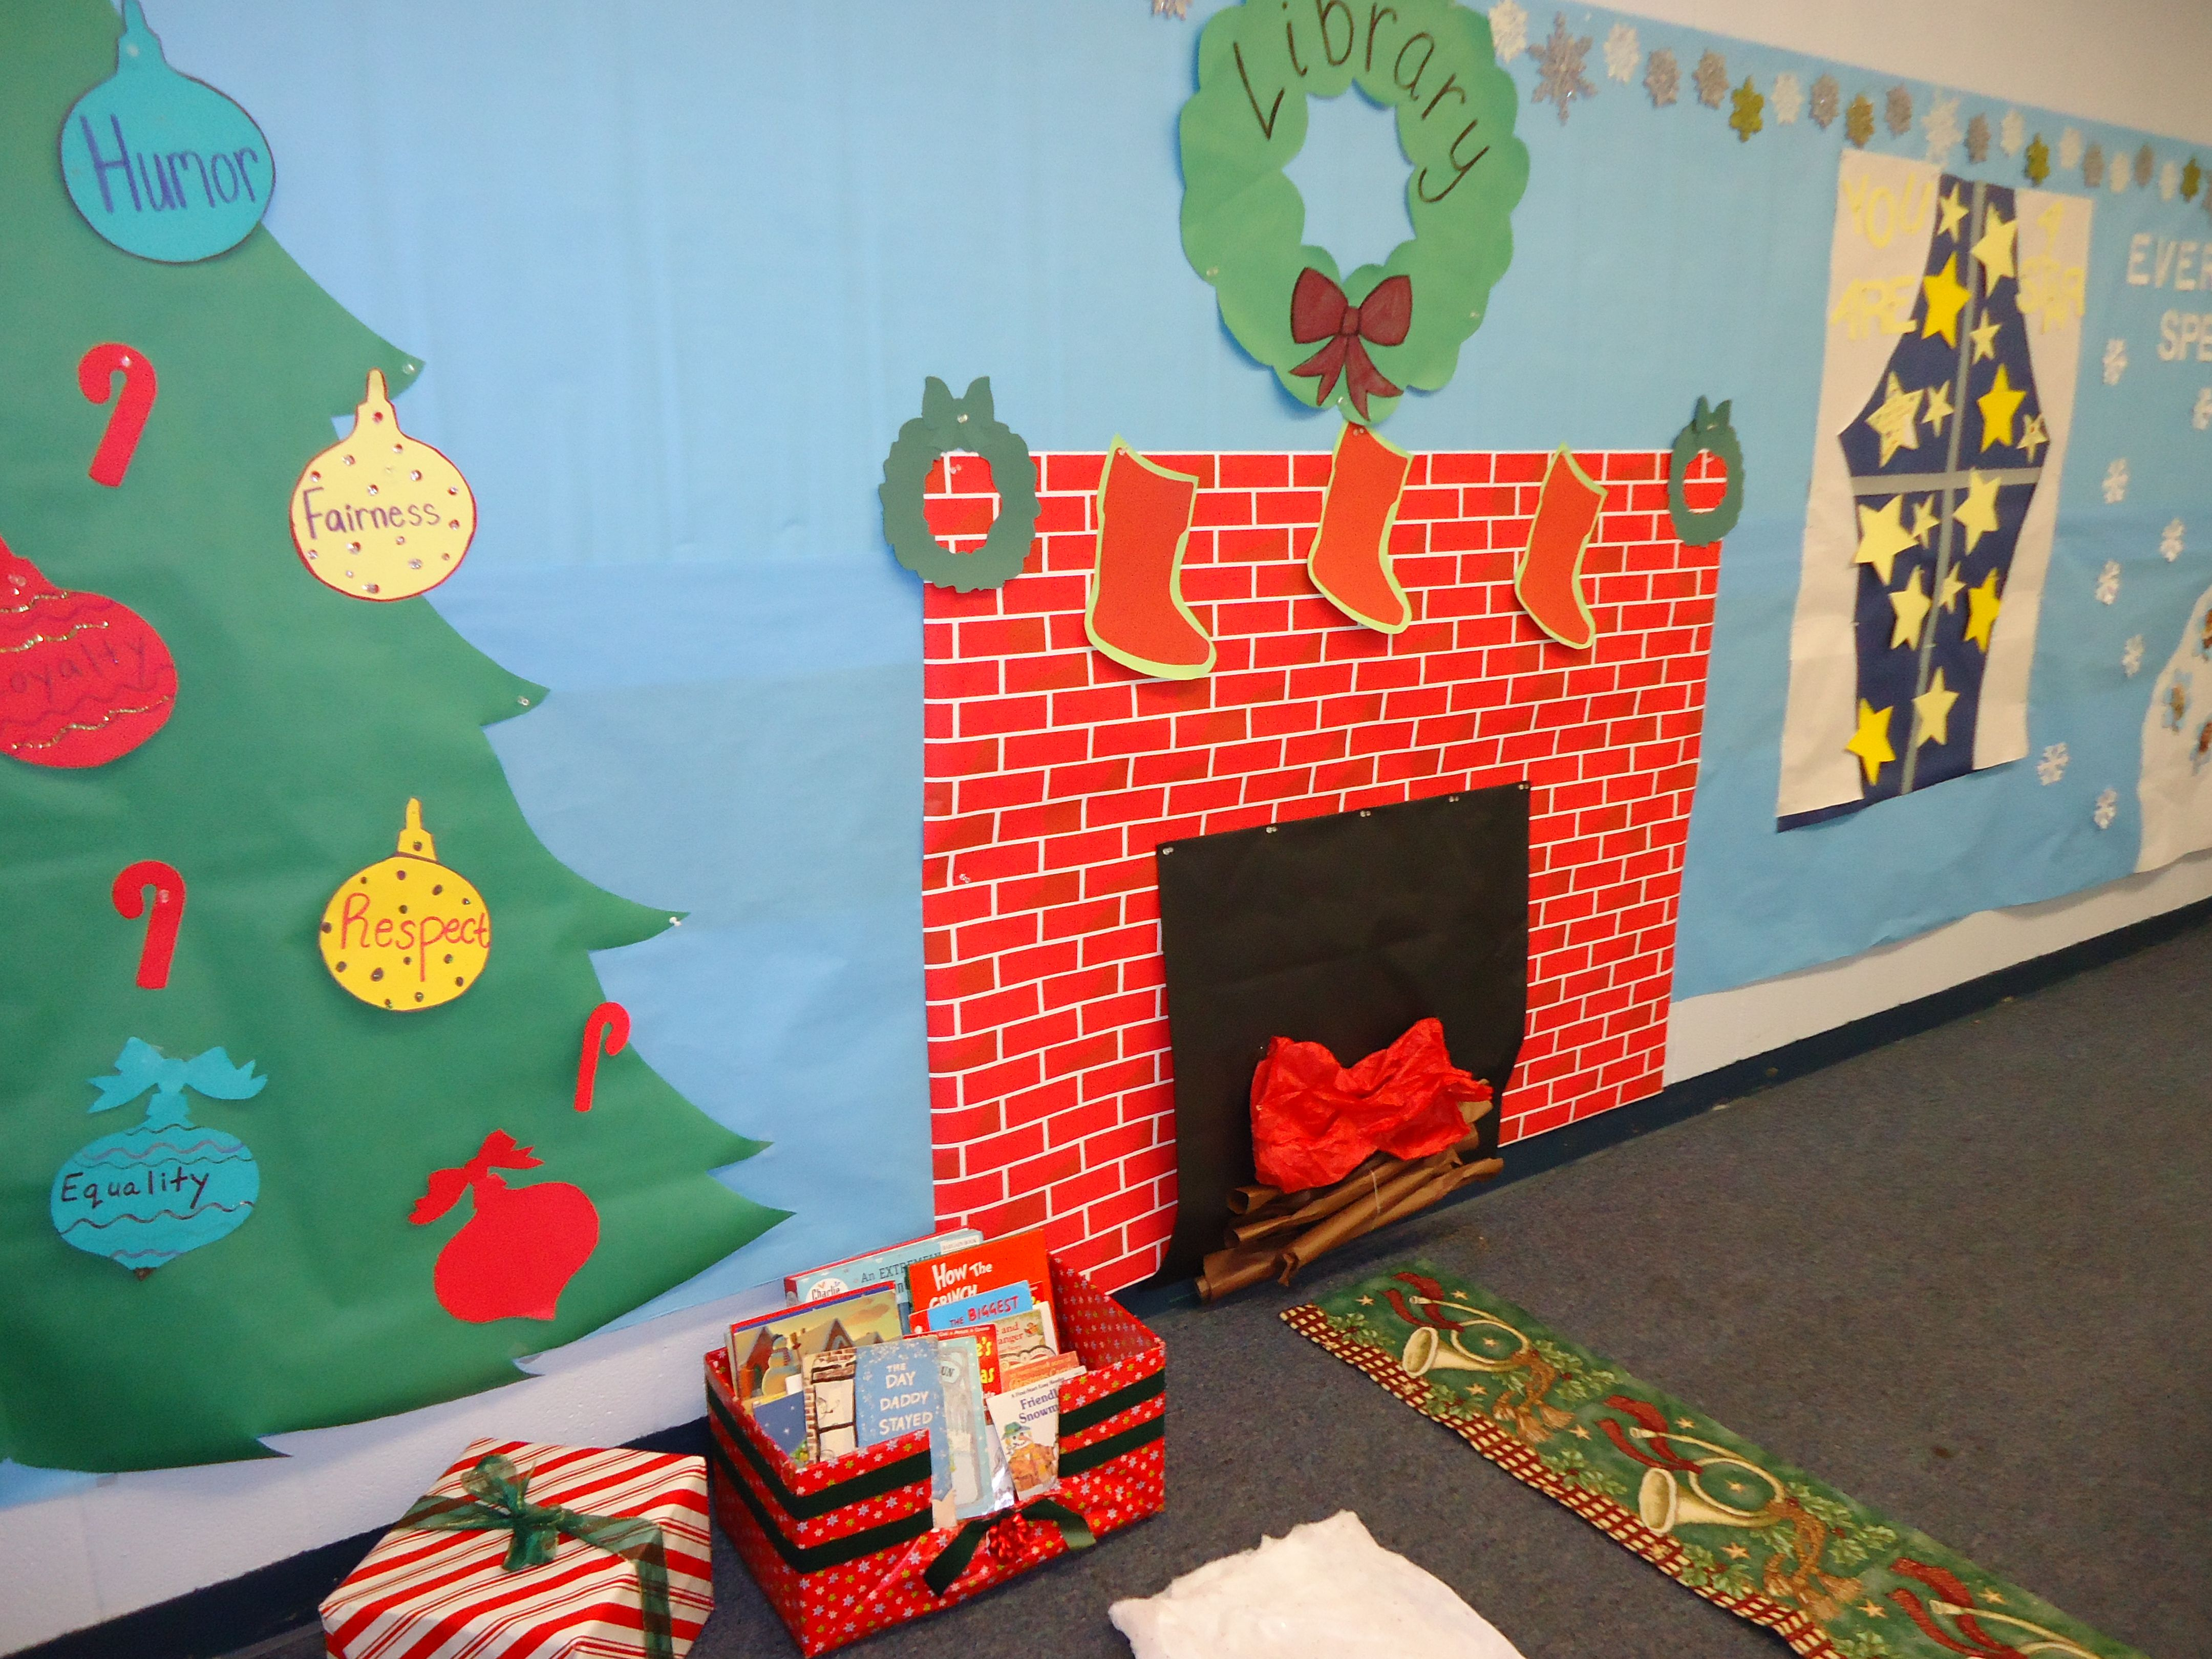 Winter Wonderland Preschool Classroom Decorations ~ Winter wonderland in the classroom school time